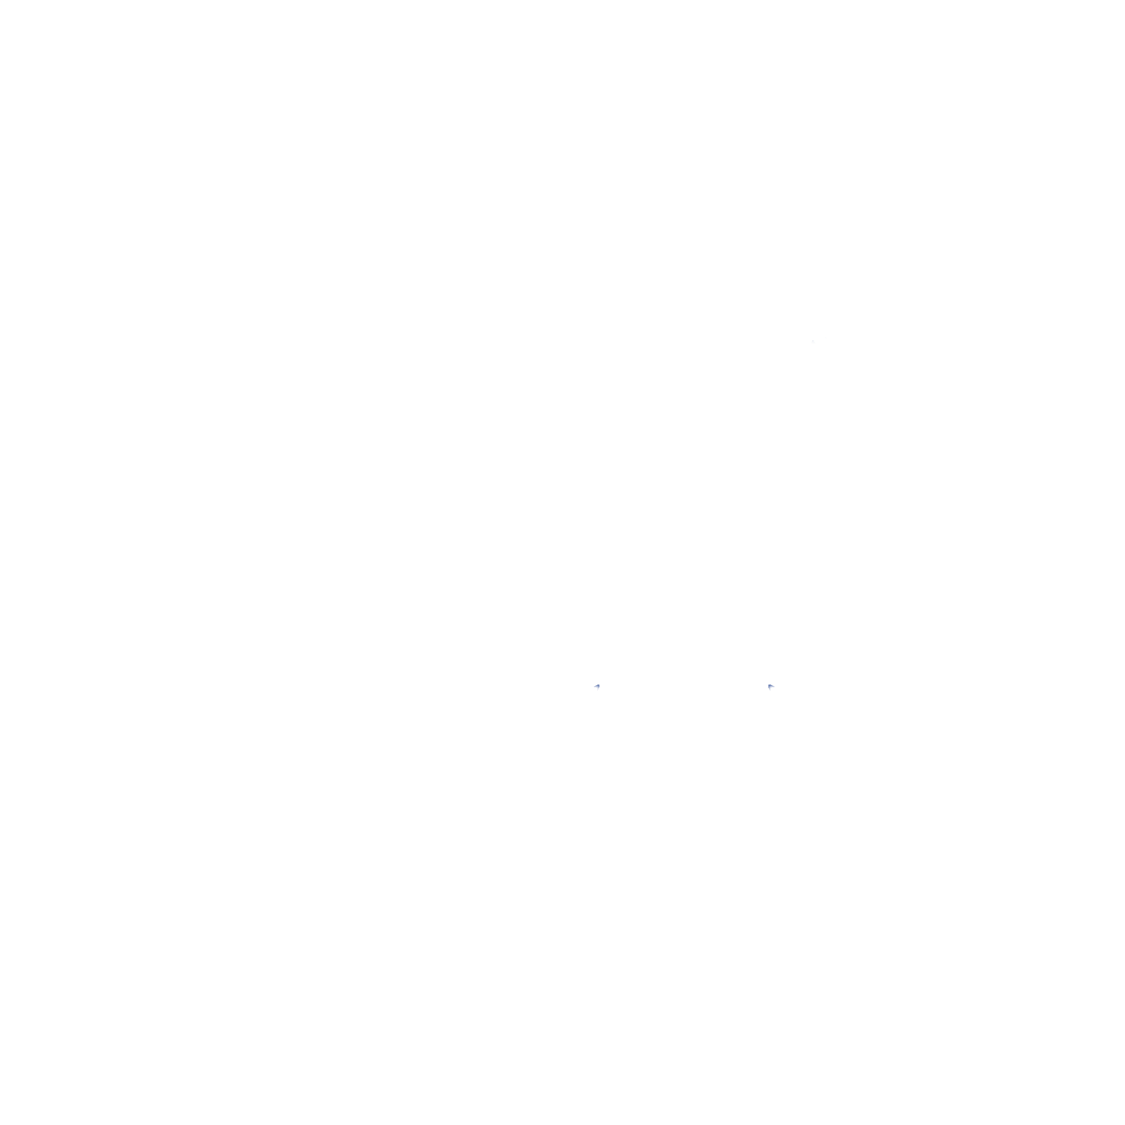 Facebook cc4a0cd1d5b58f026fe395631ceeb0b32a0a053e965e60cf1073a58d694730a9